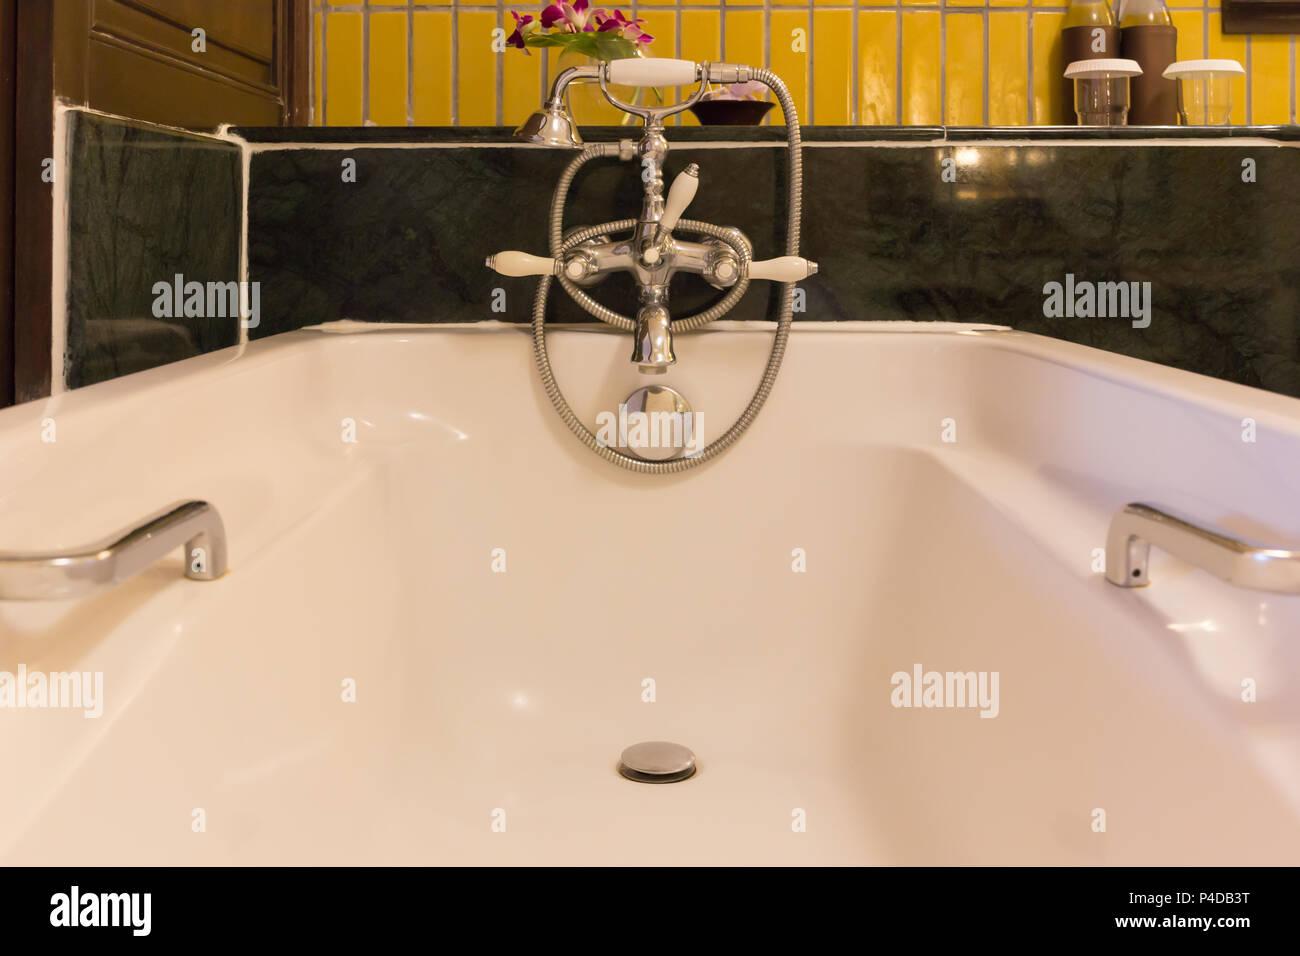 Vasca Da Bagno Per Hotel : Vasca da bagno su bagno design di interni in hotel di lusso foto